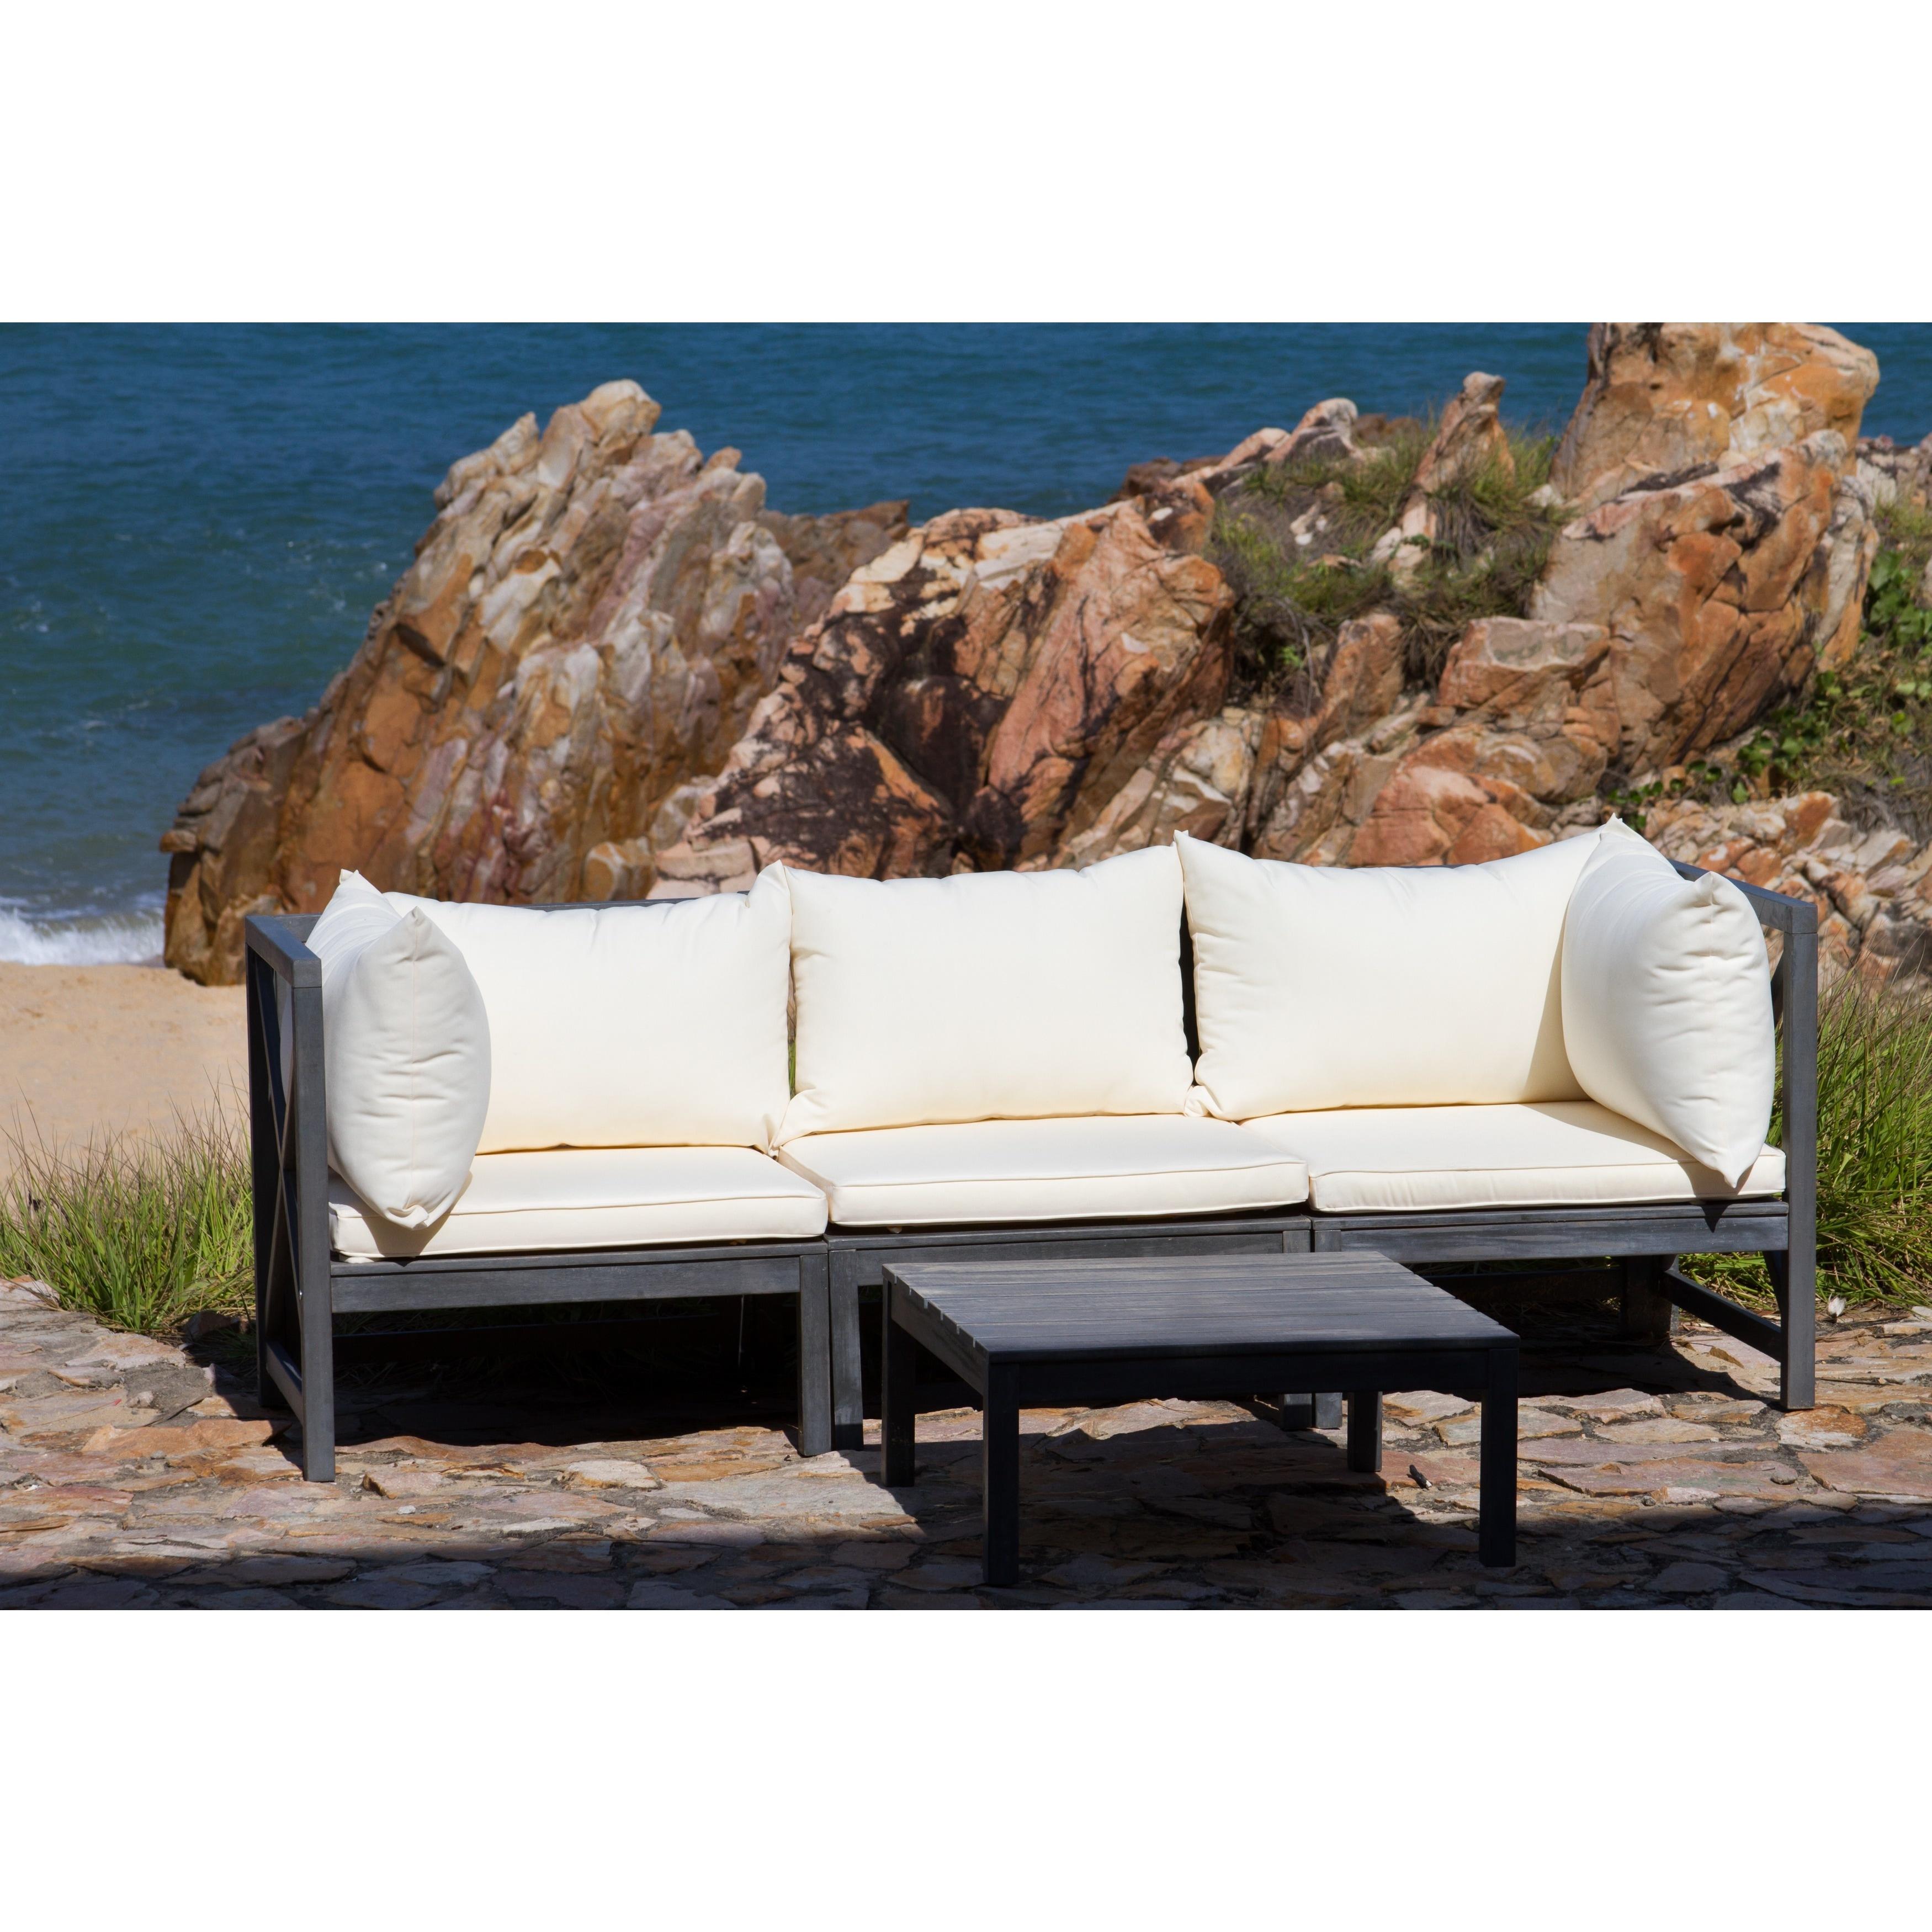 Safavieh Outdoor Living Lynwood Modular Ash Grey Acacia Wood 4-piece Beige Cushion Sectional Set - PAT6713C